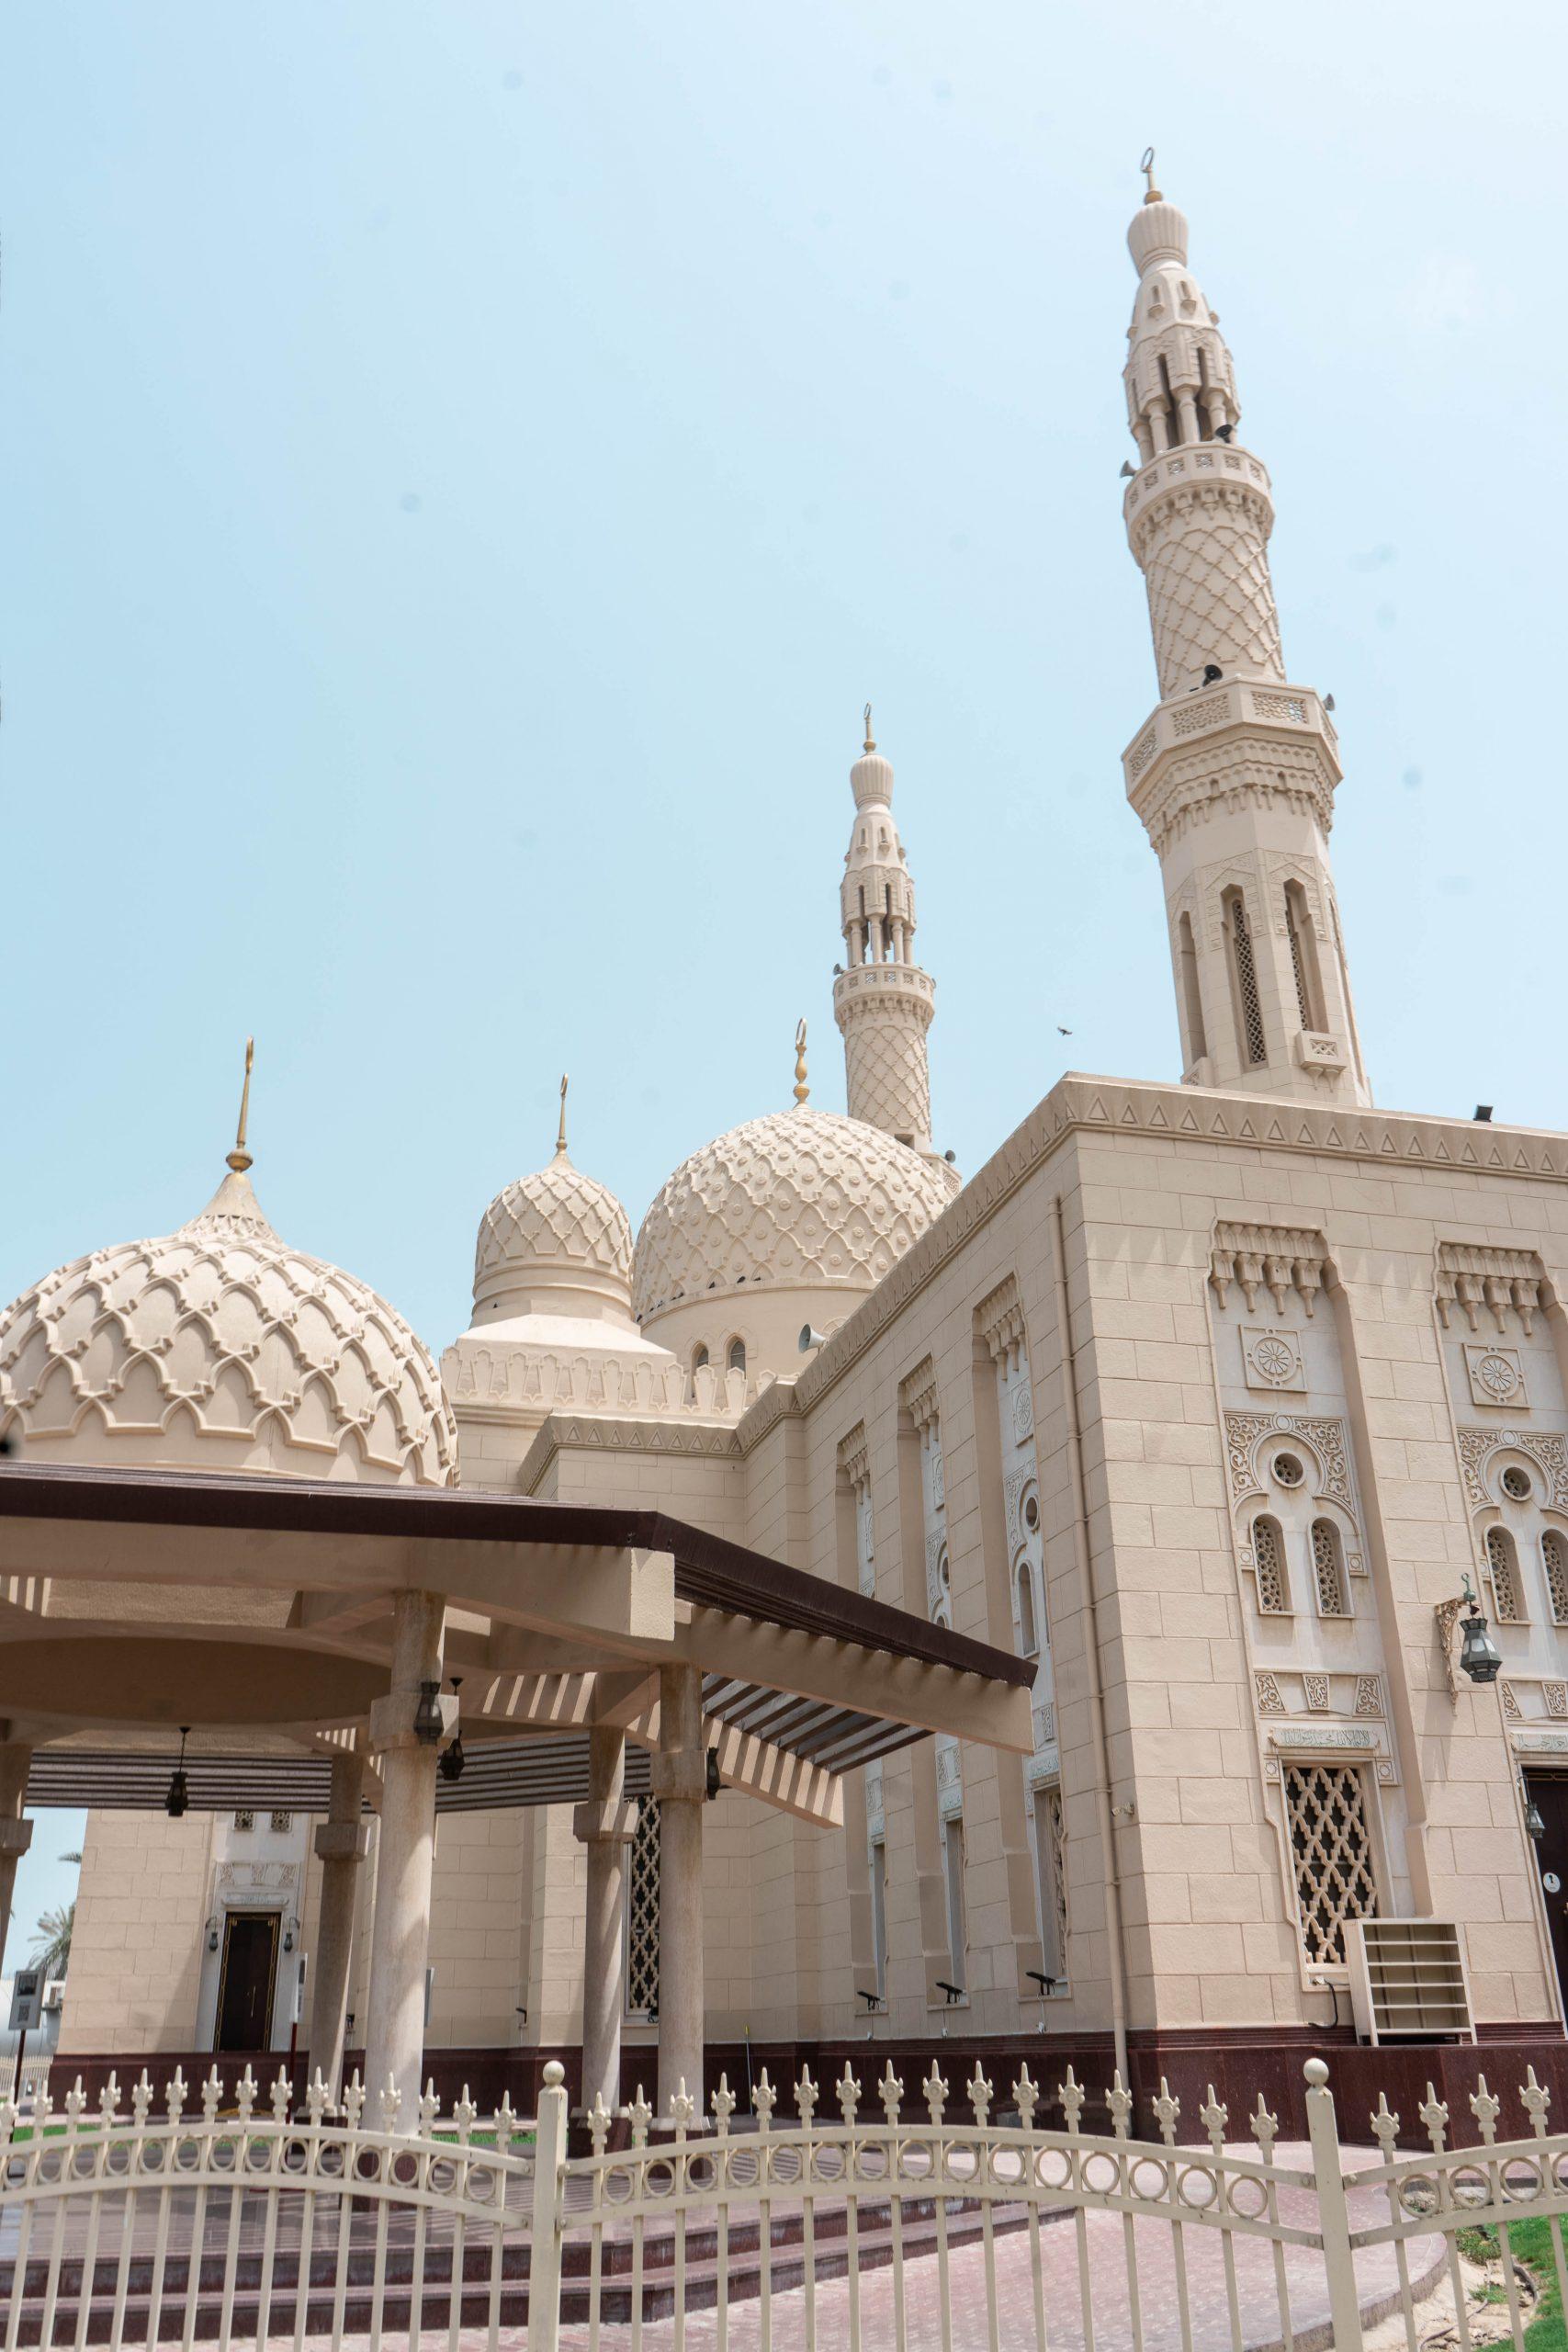 jumeirah mosque dubai uae united arab emirates masjid entrance